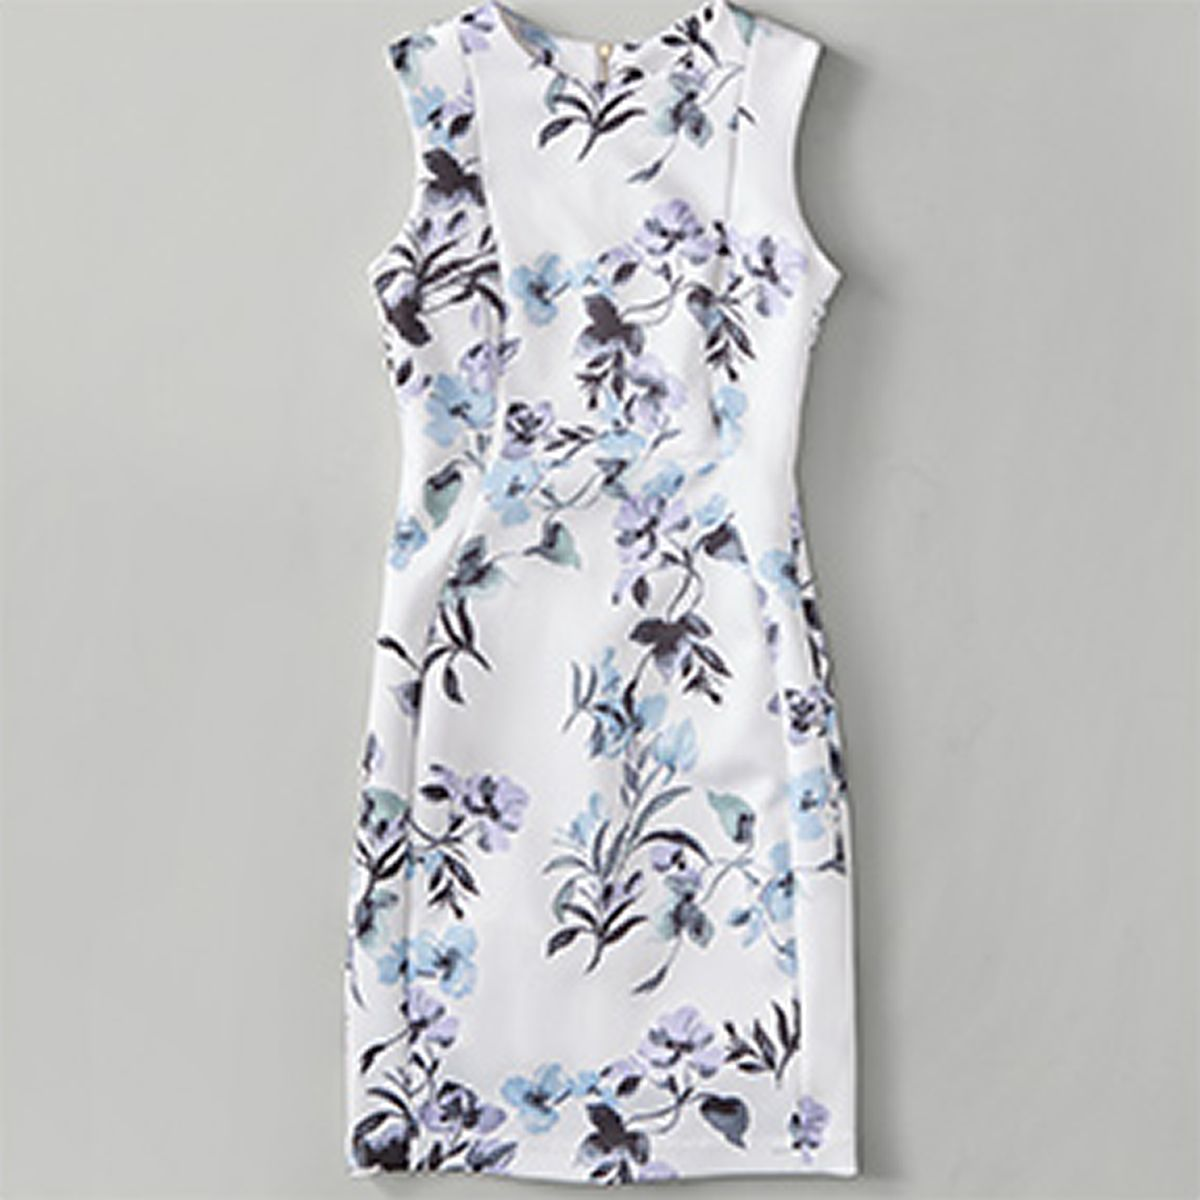 a361b941c1a Petite Clothing - Petite Women s Clothing   Fashion - Macy s